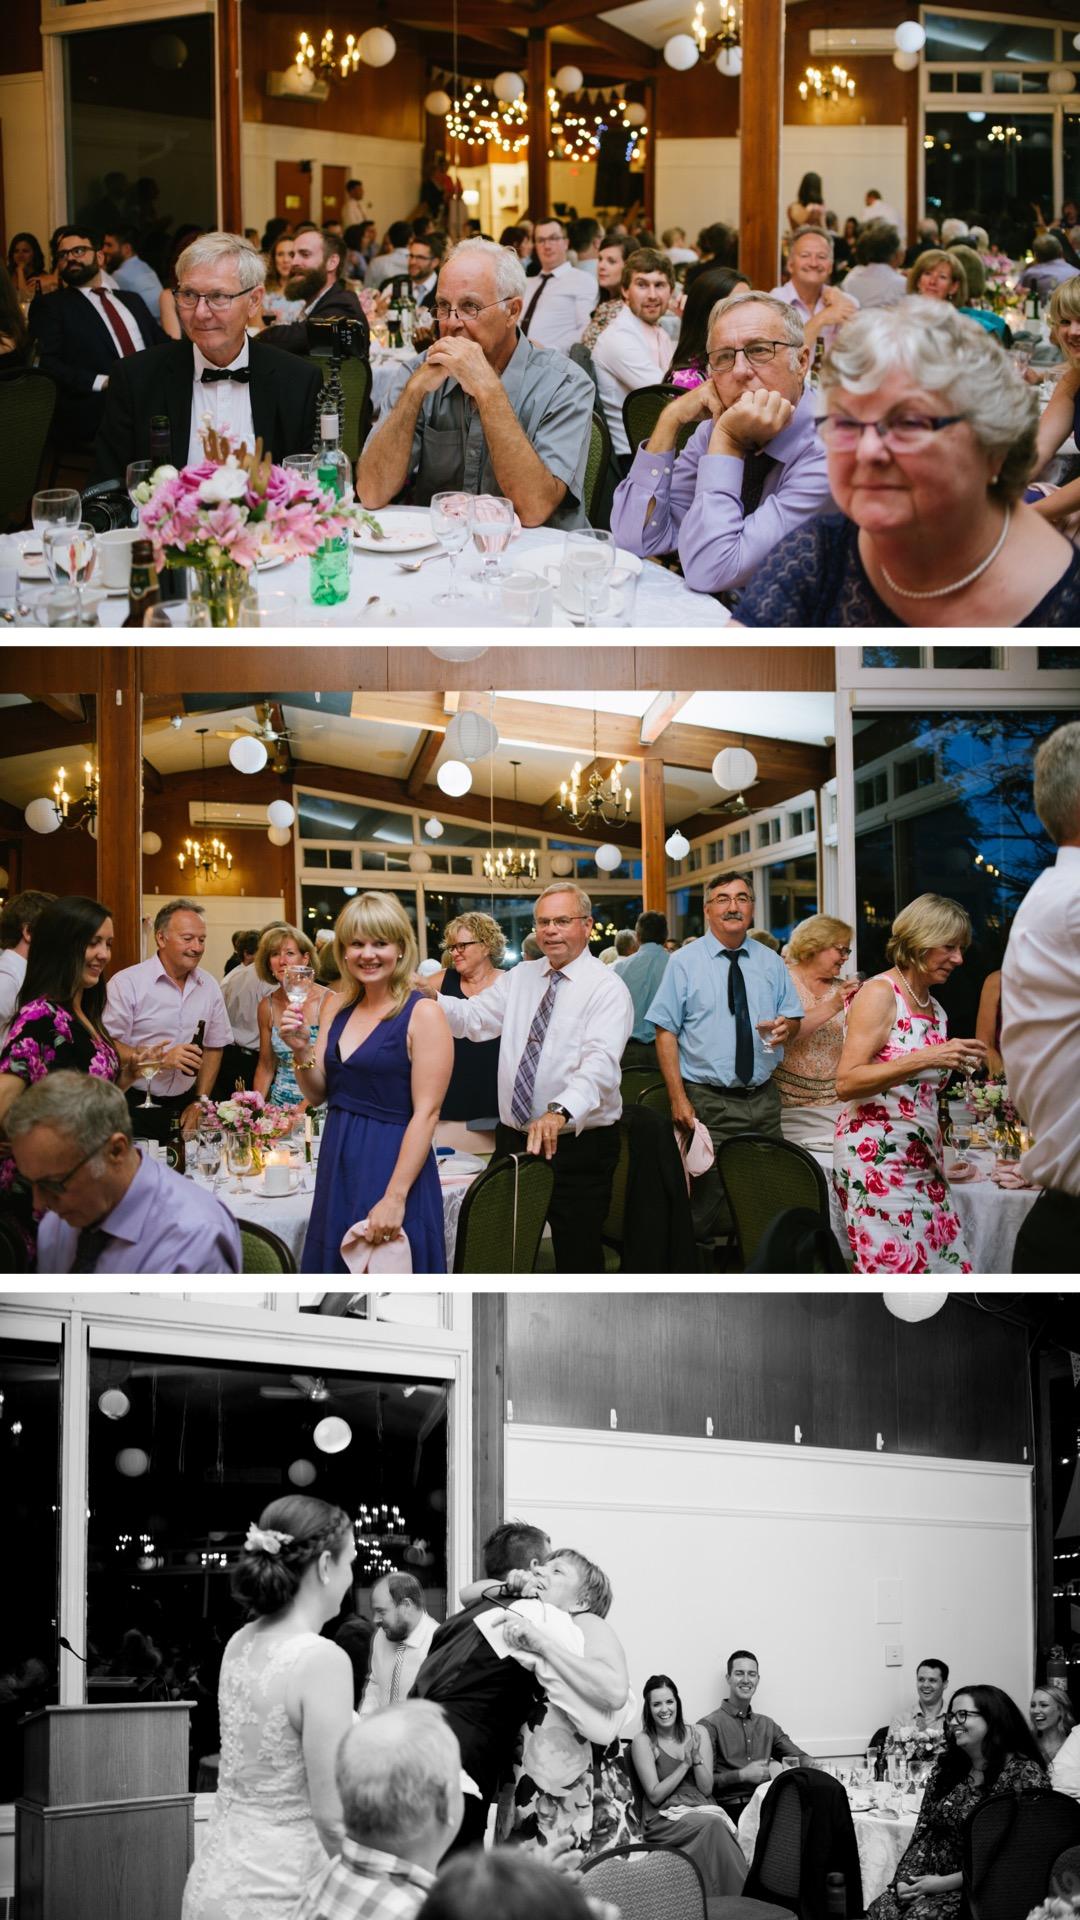 Martina & Scott Halifax Wedding Photographer - Sinead Dubeau Photography 27